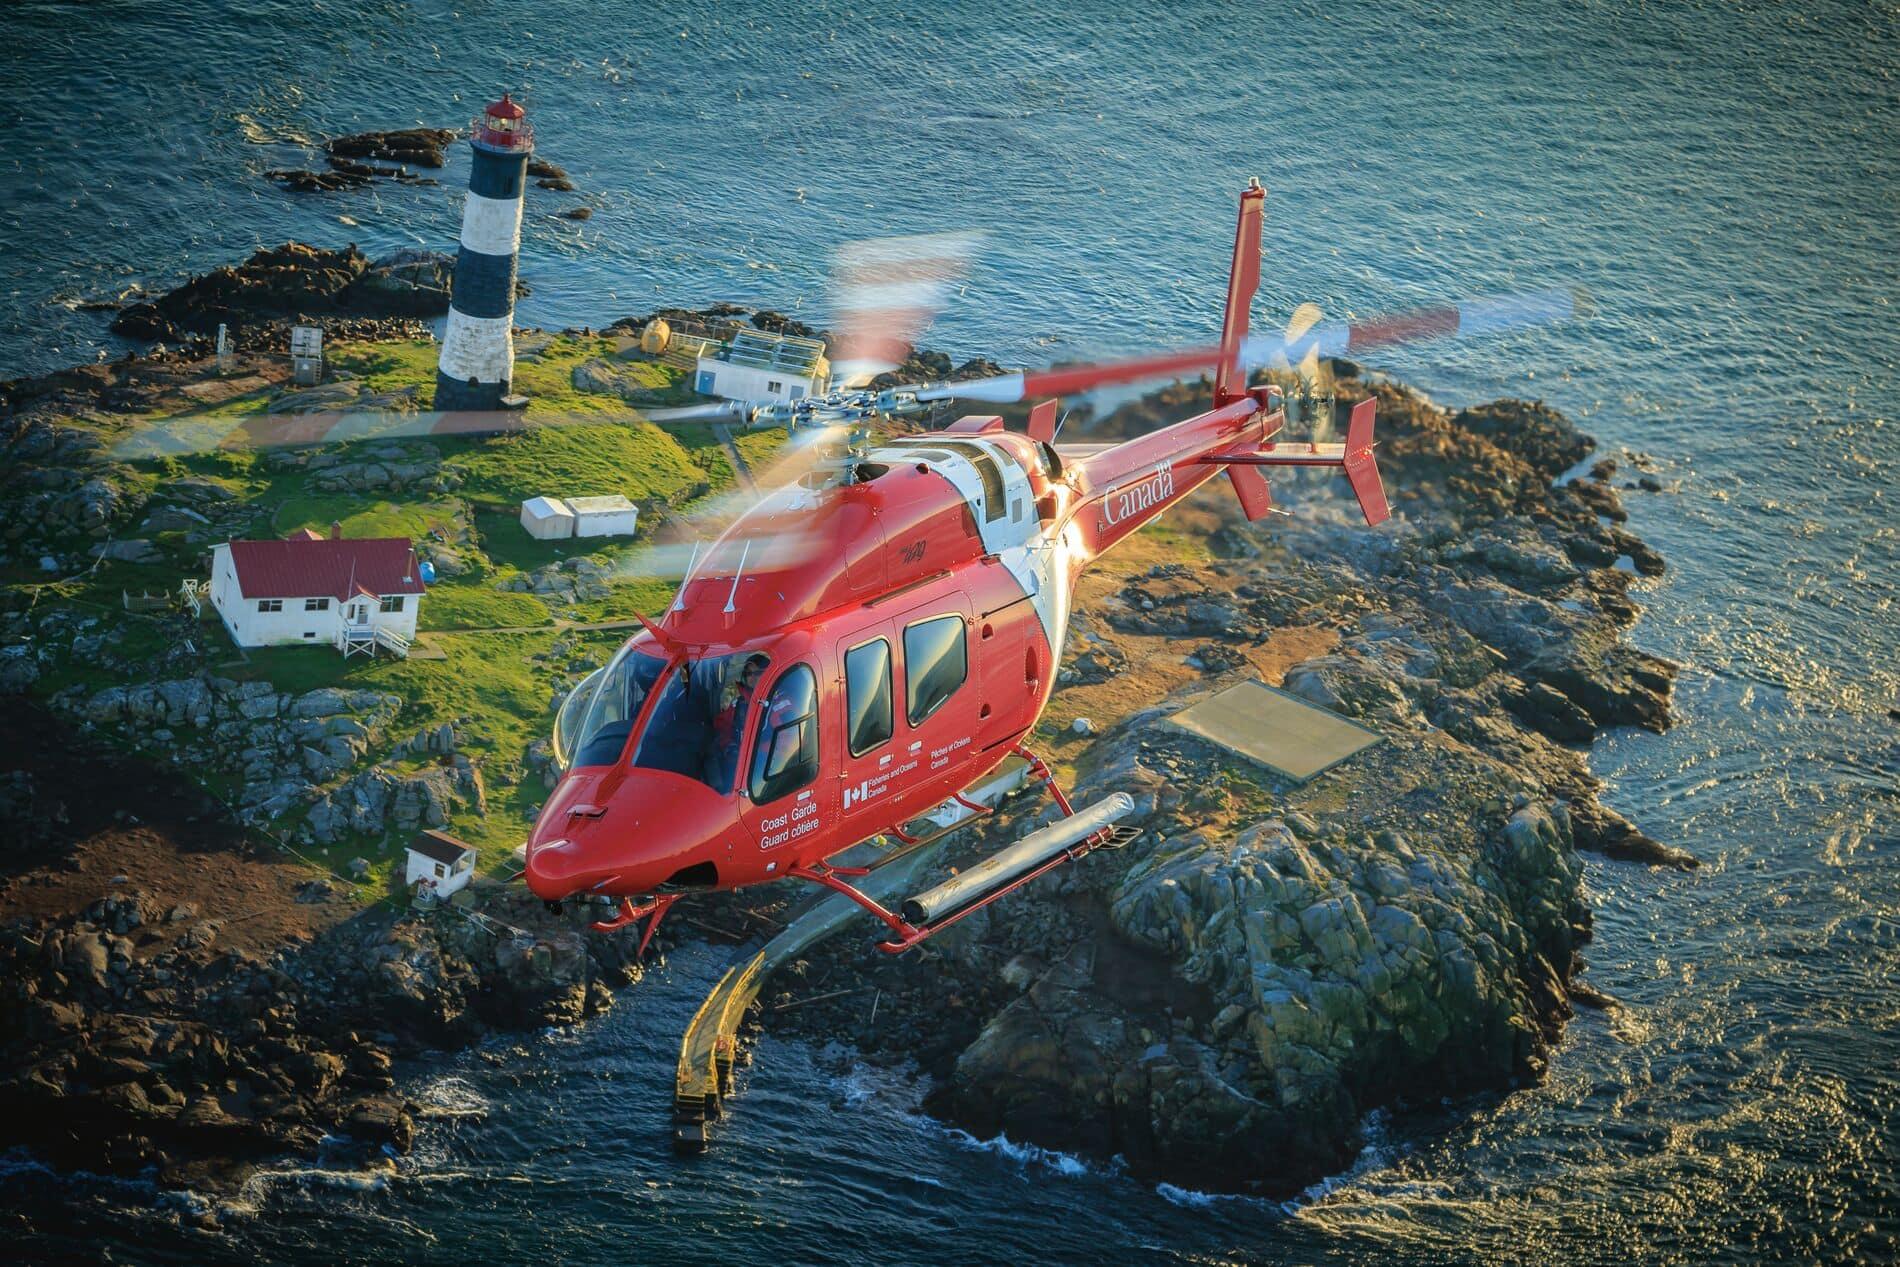 Web_Hero-05-MAY_HERO_429_Canadian-Coast-Guard_158-15-406_2015_layered